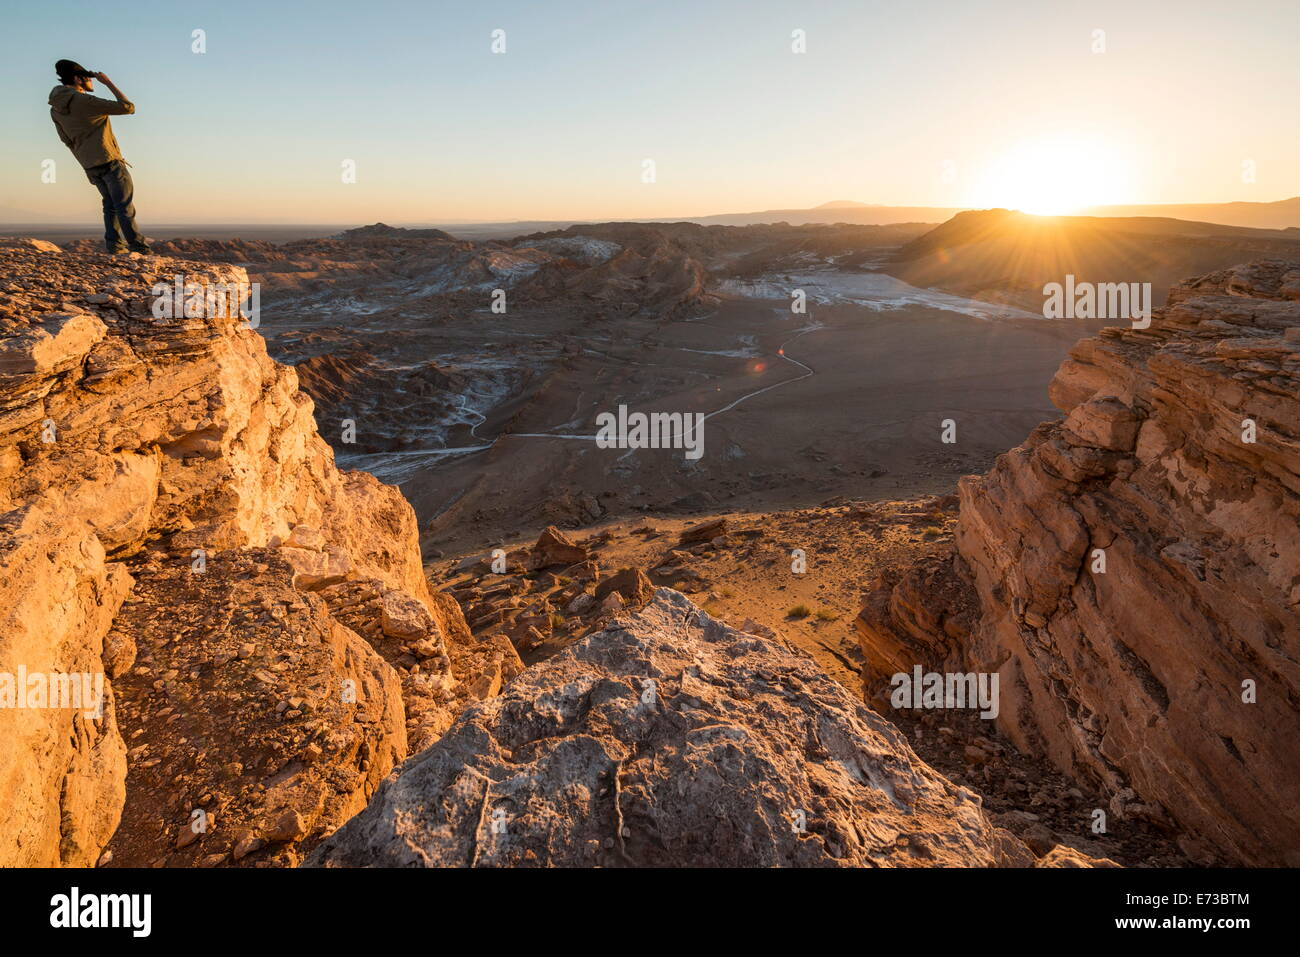 Valle De La Luna (Tal des Mondes), Atacama-Wüste, El Norte Grande, Chile, Südamerika Stockbild